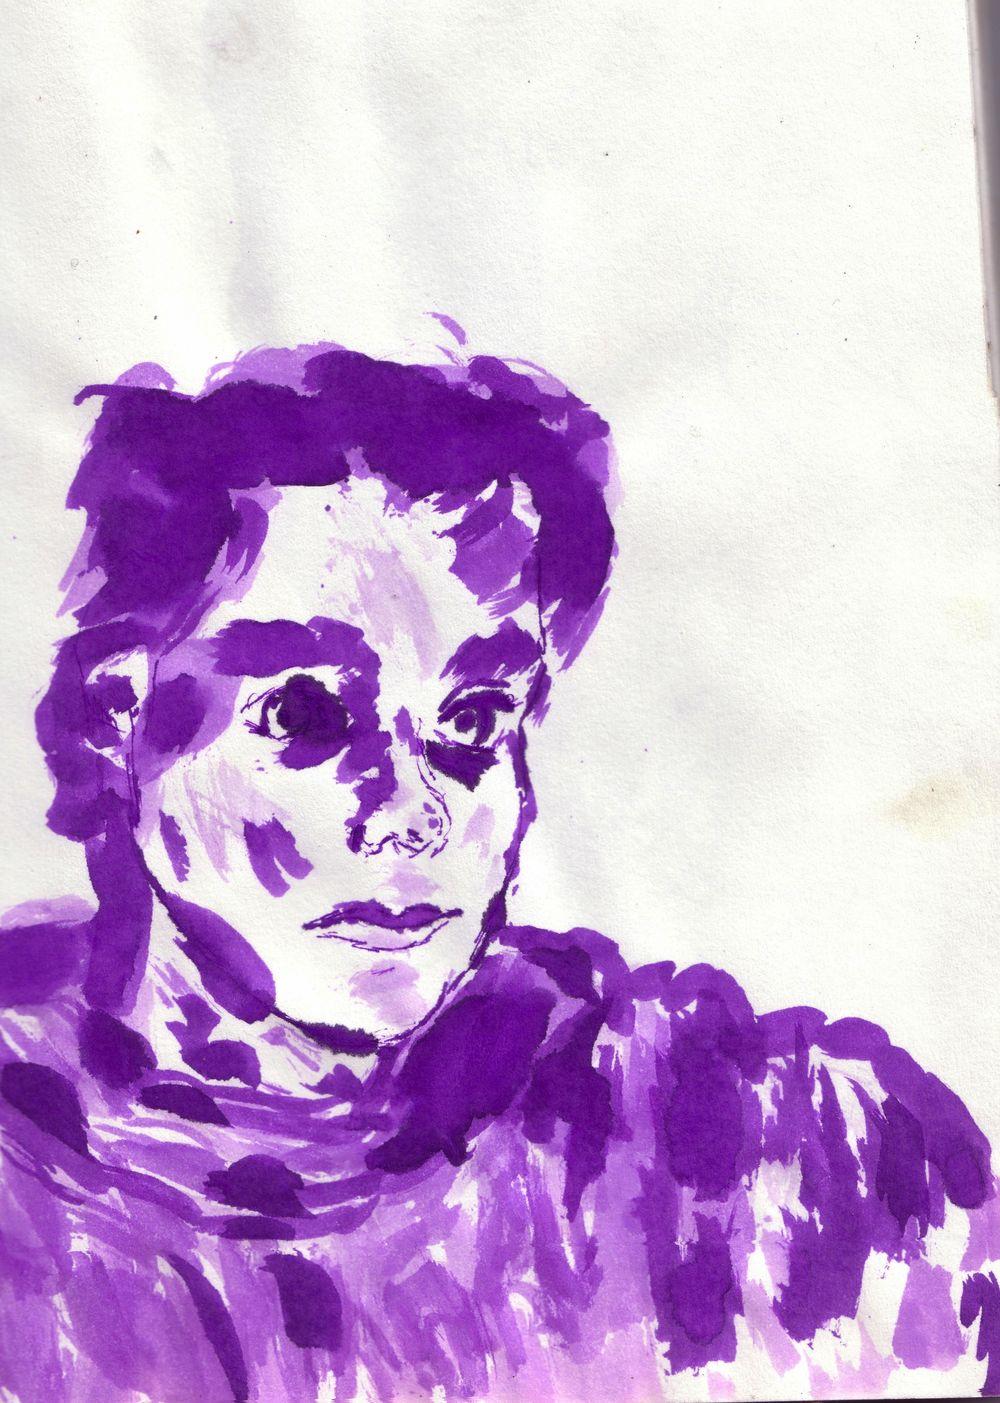 aw-art-purpleme